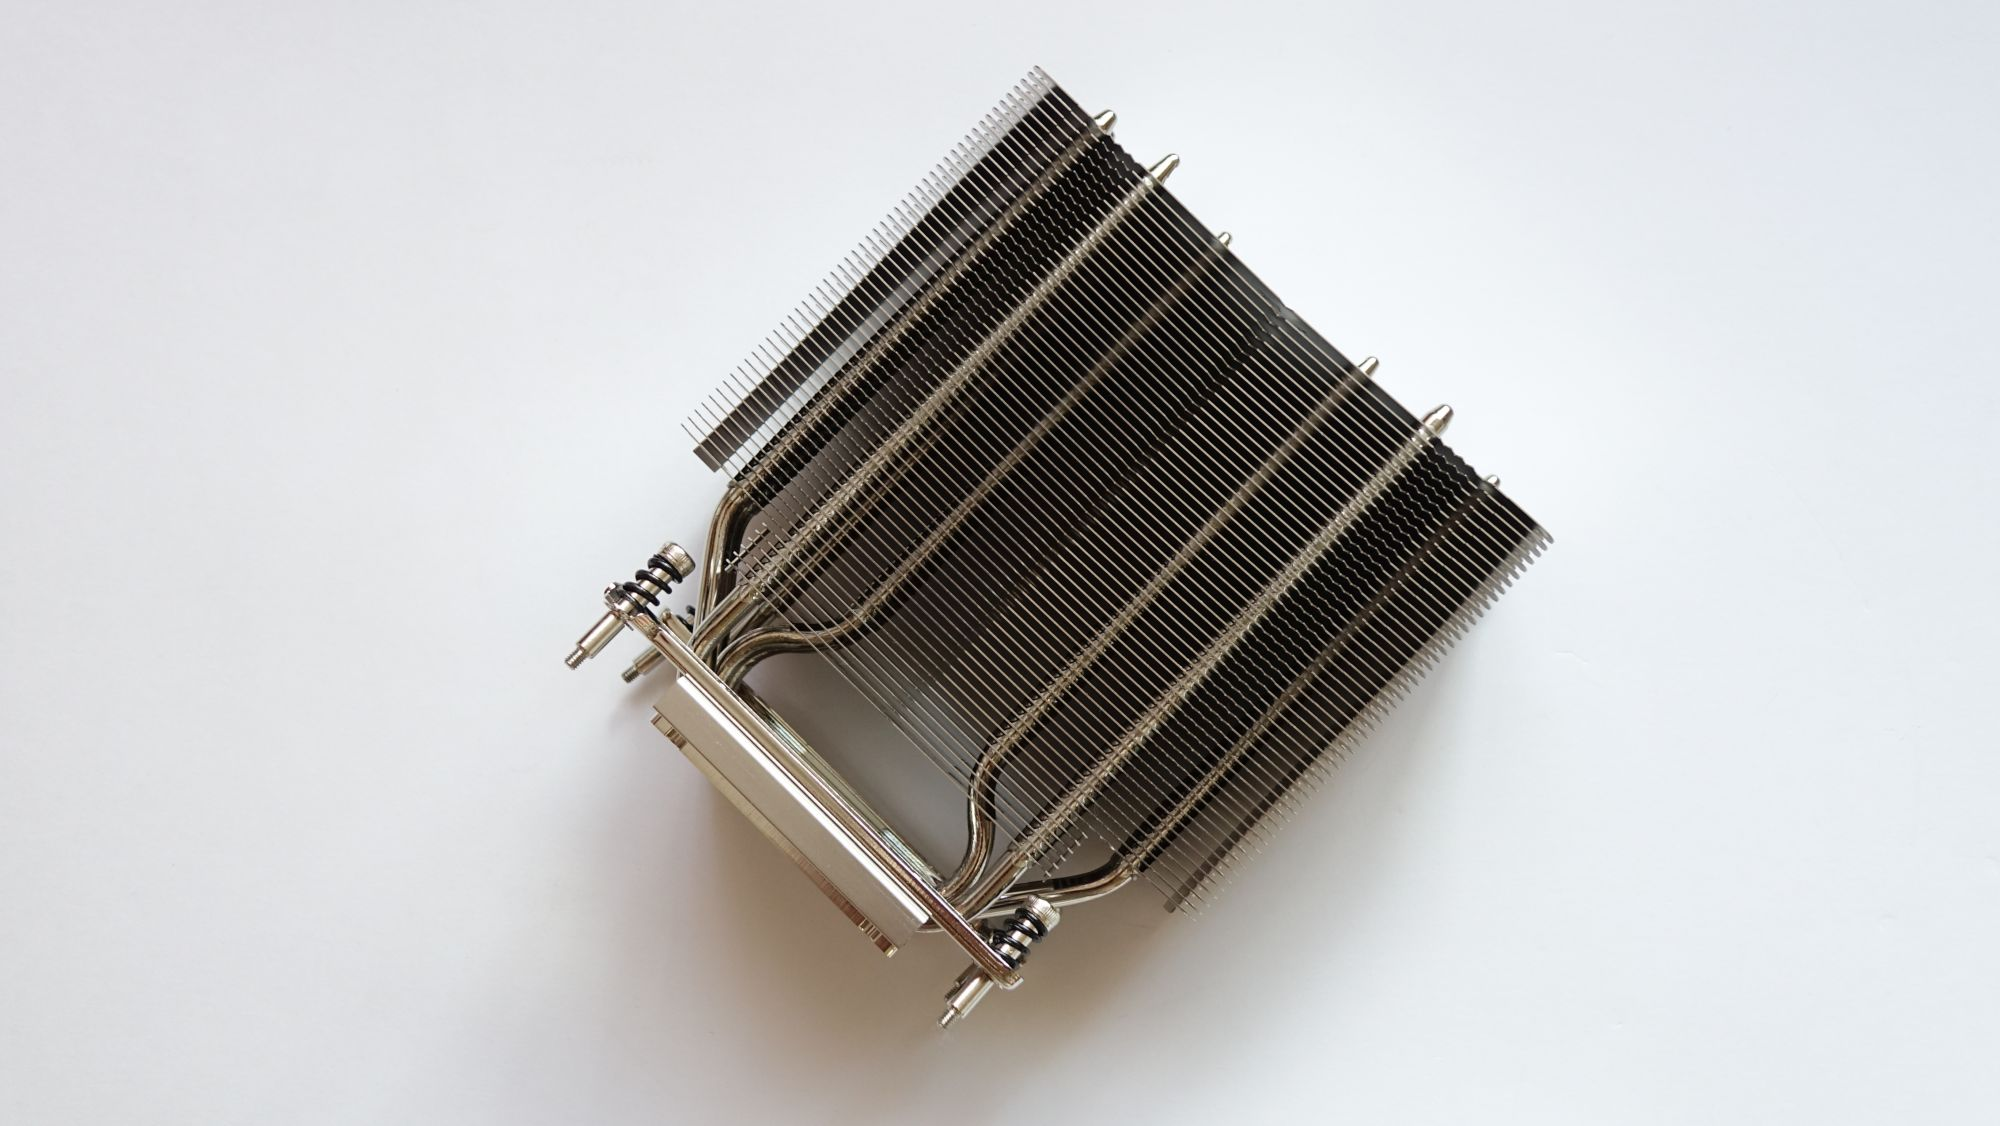 NH-U14S TR4-SP3 радиатор